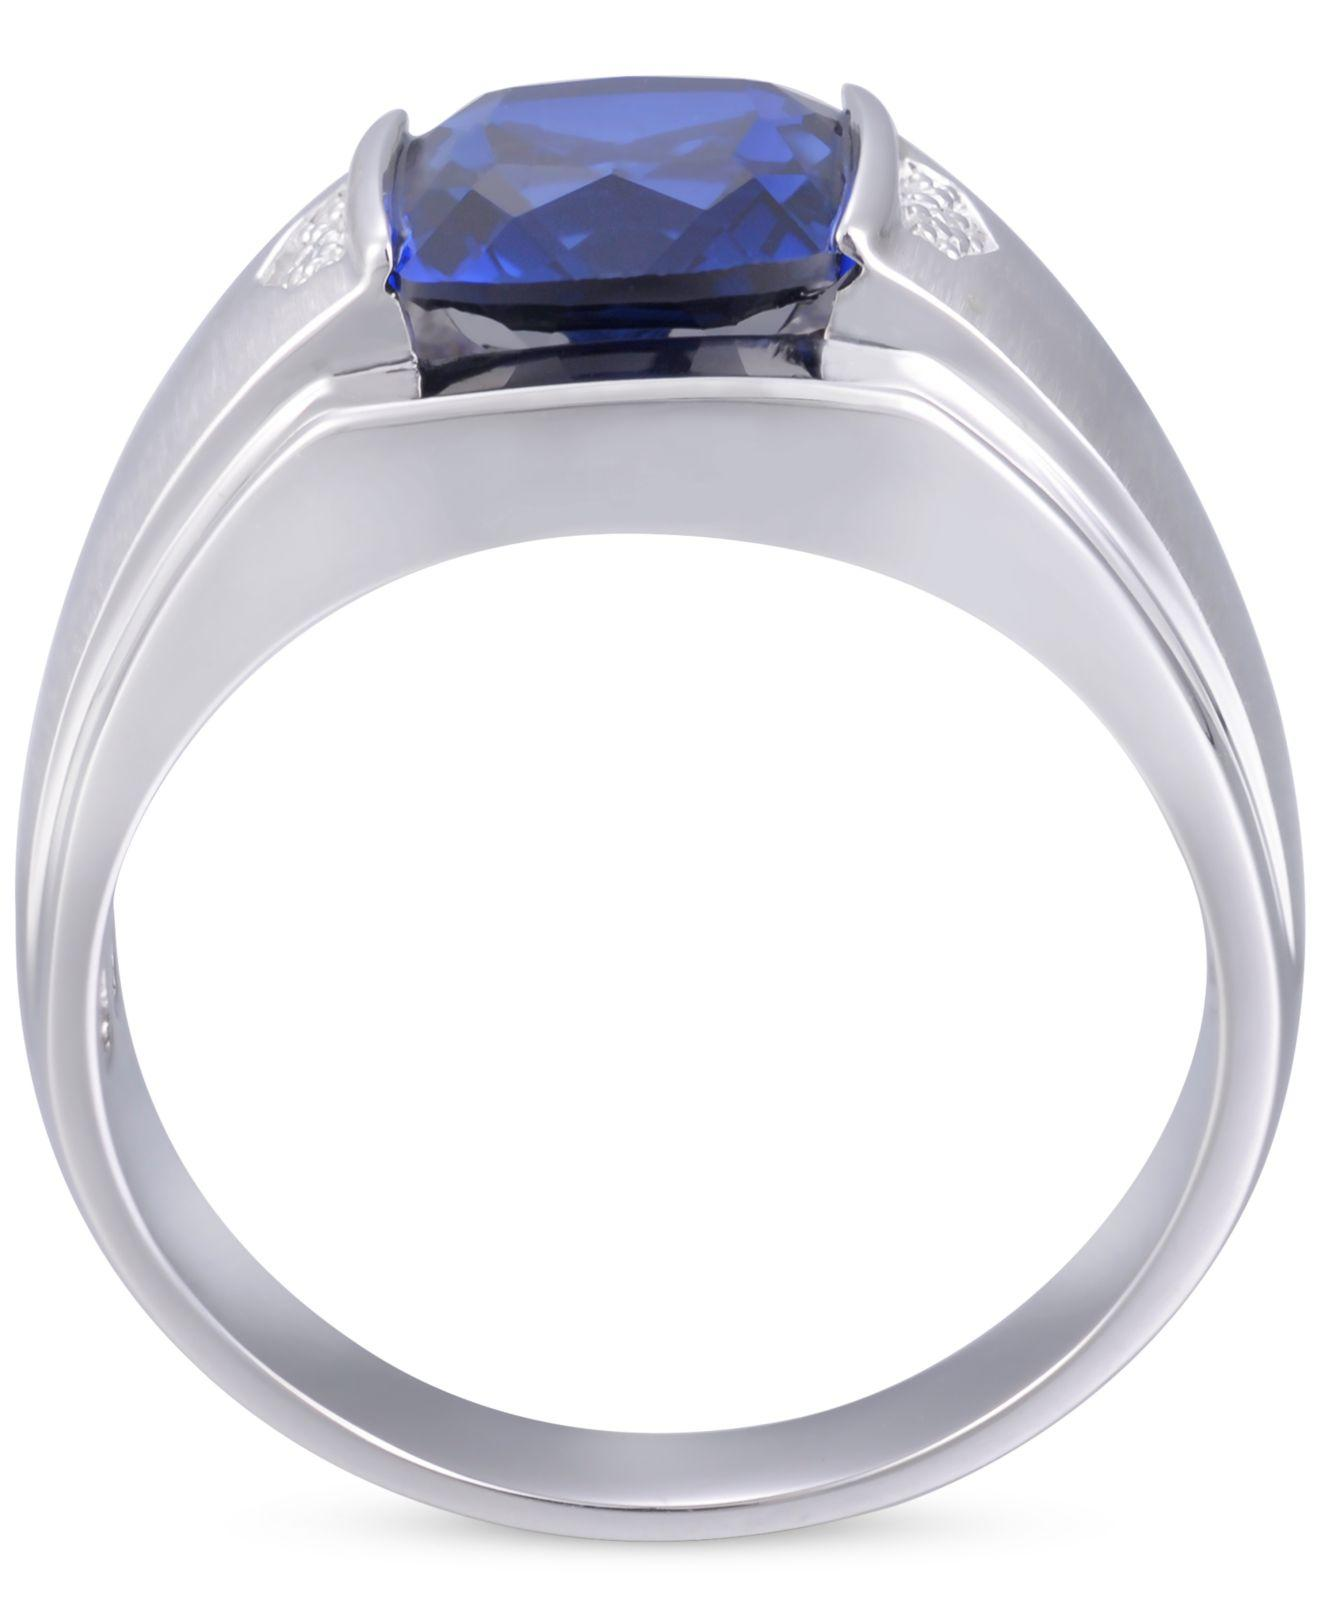 16310861a45e Macy's Men's Lab-created Blue Sapphire (5 Ct. T.w.) & Diamond Accent ...